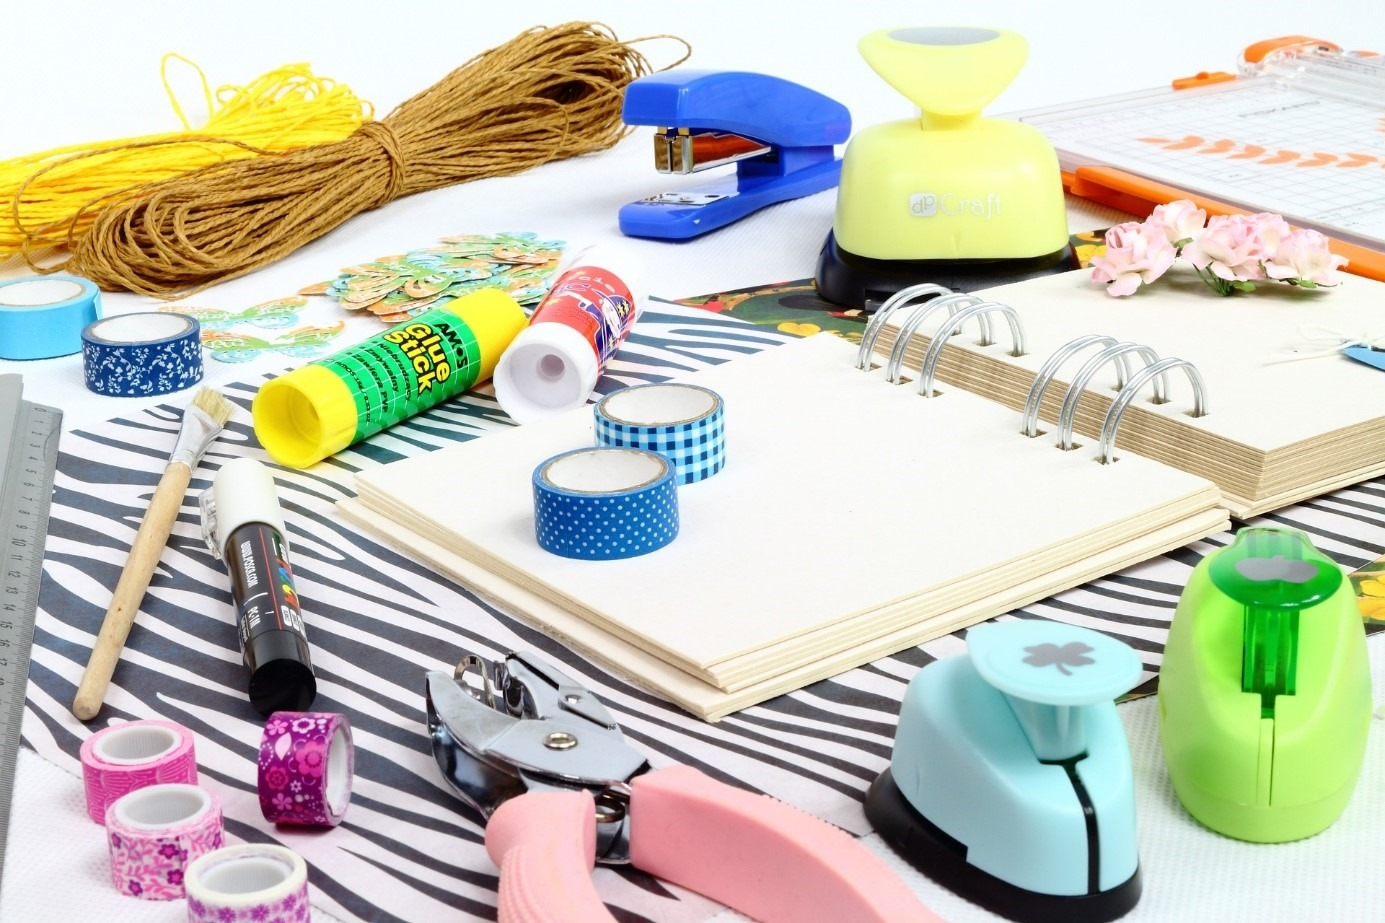 Design ideas for your children's memory books